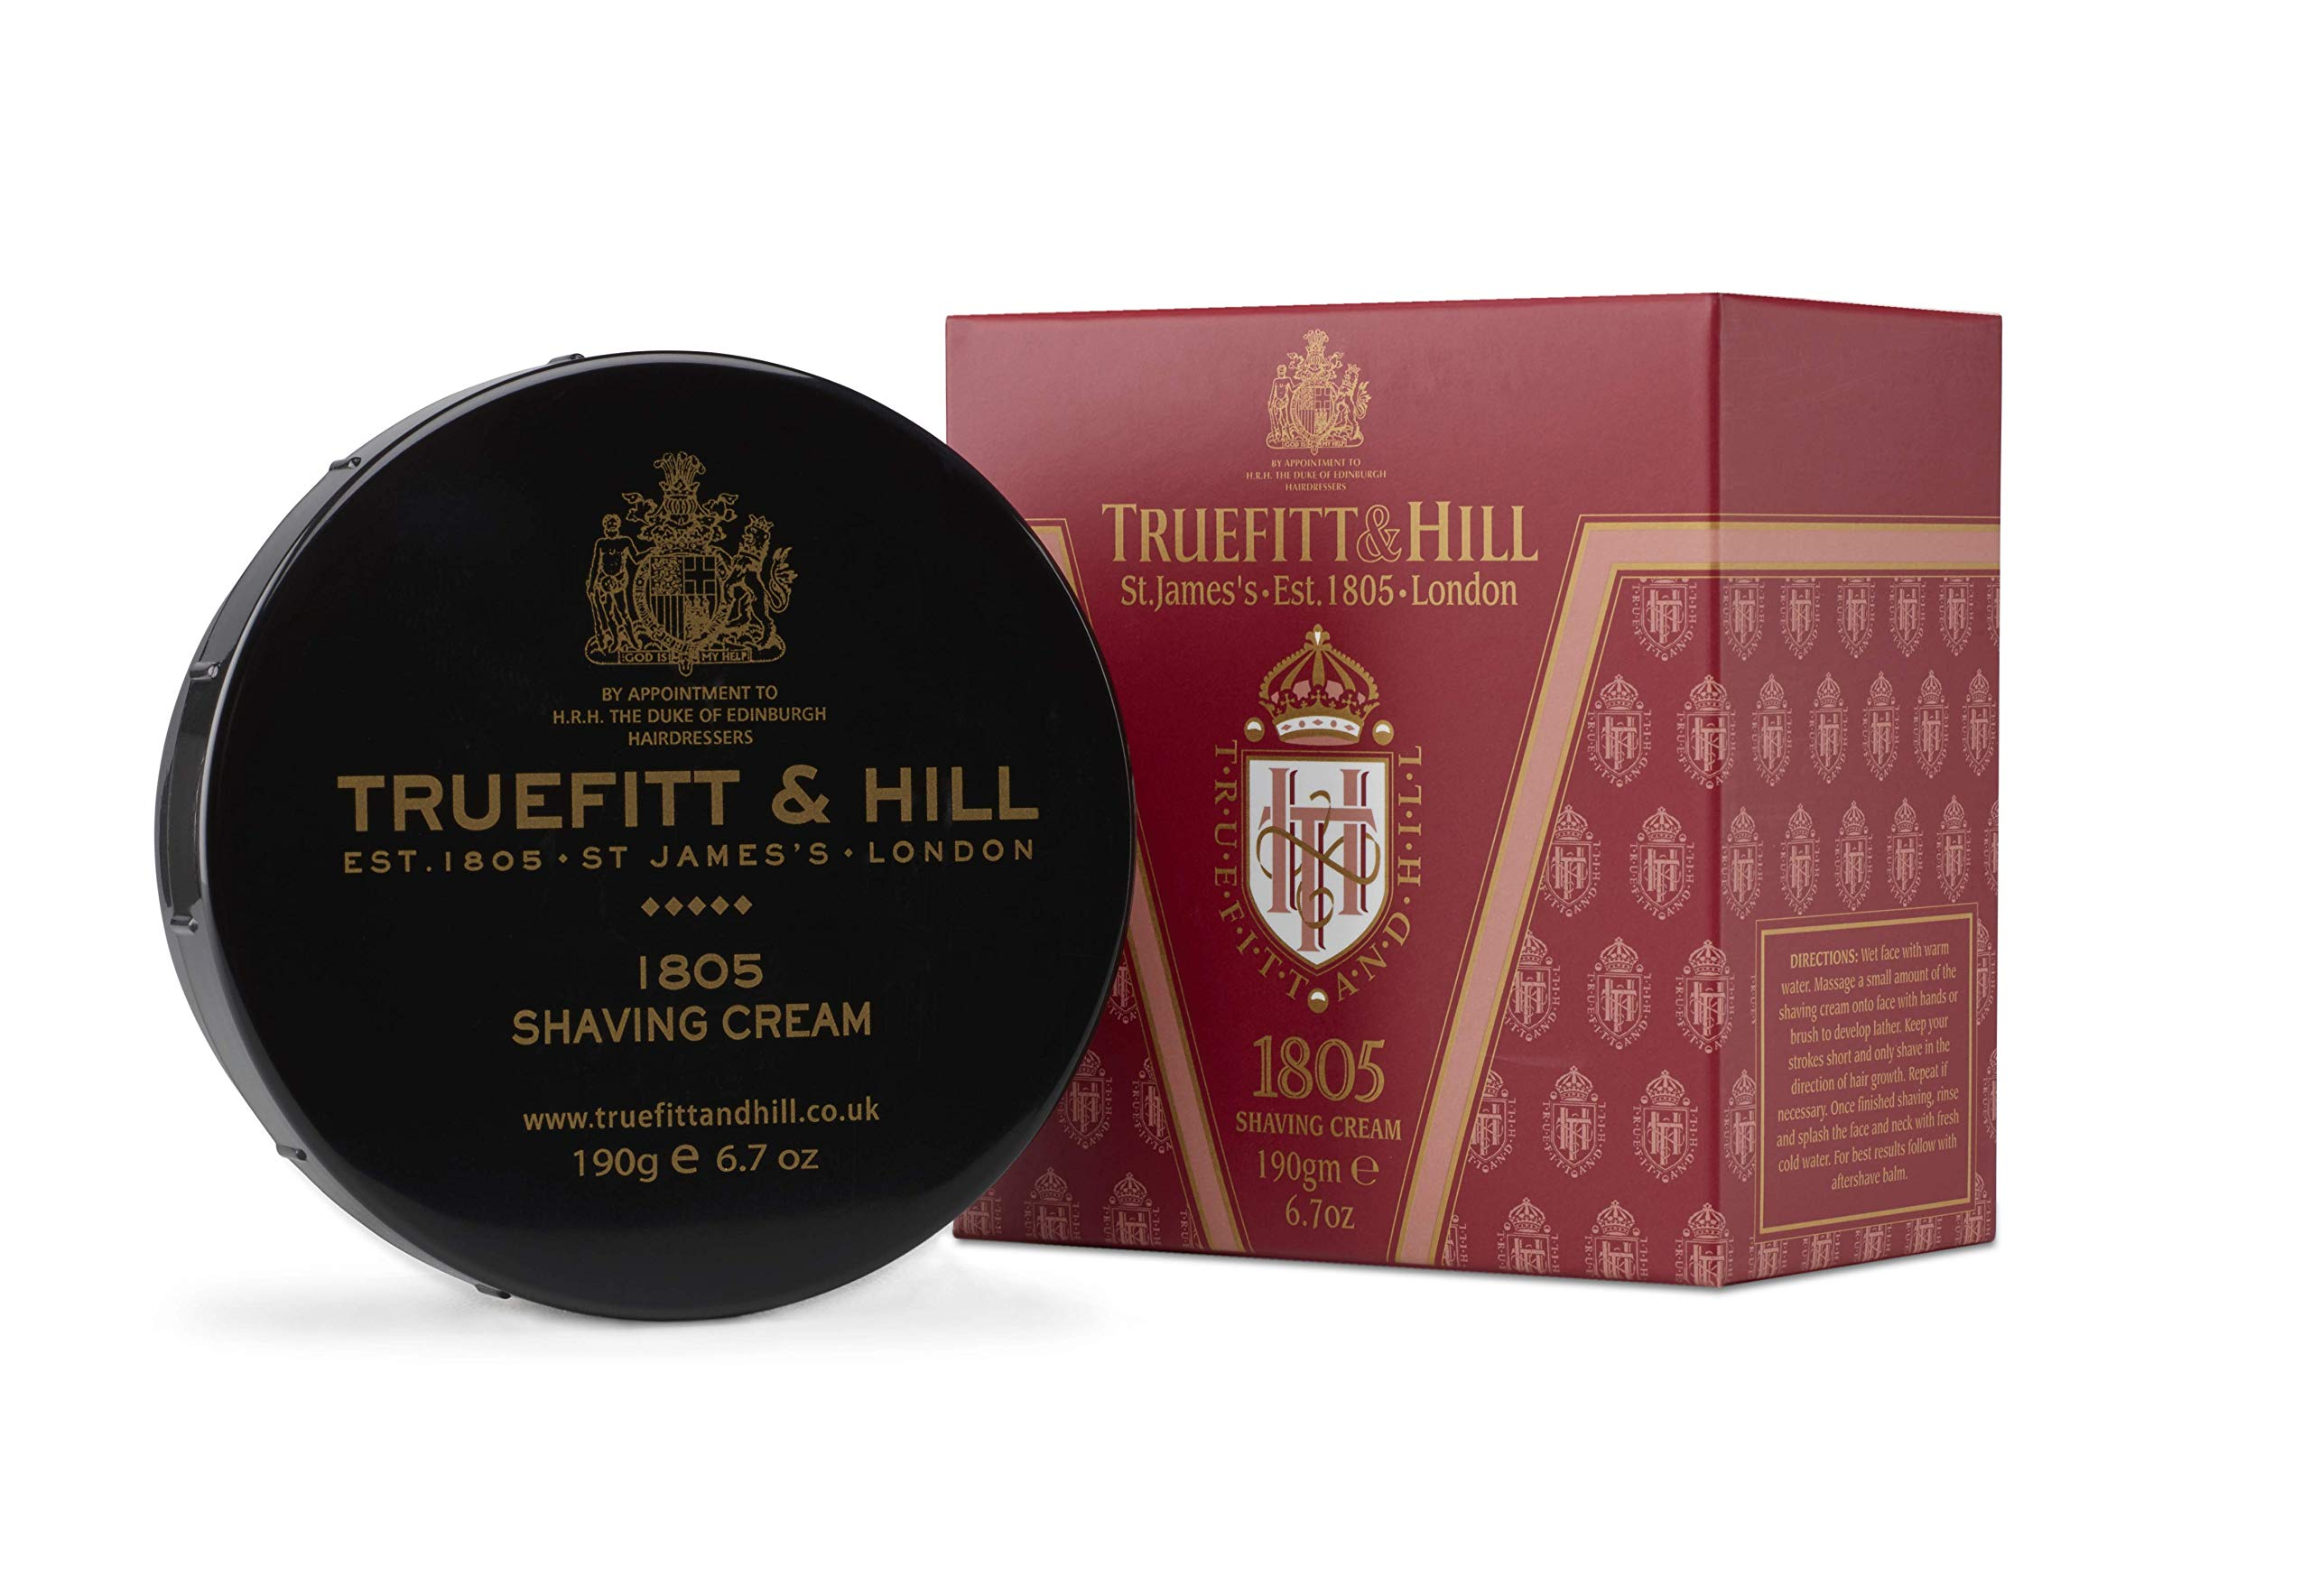 Truefitt & Hill Shave Cream Bowl-1805 (6.7 ounces) by Truefitt & Hill